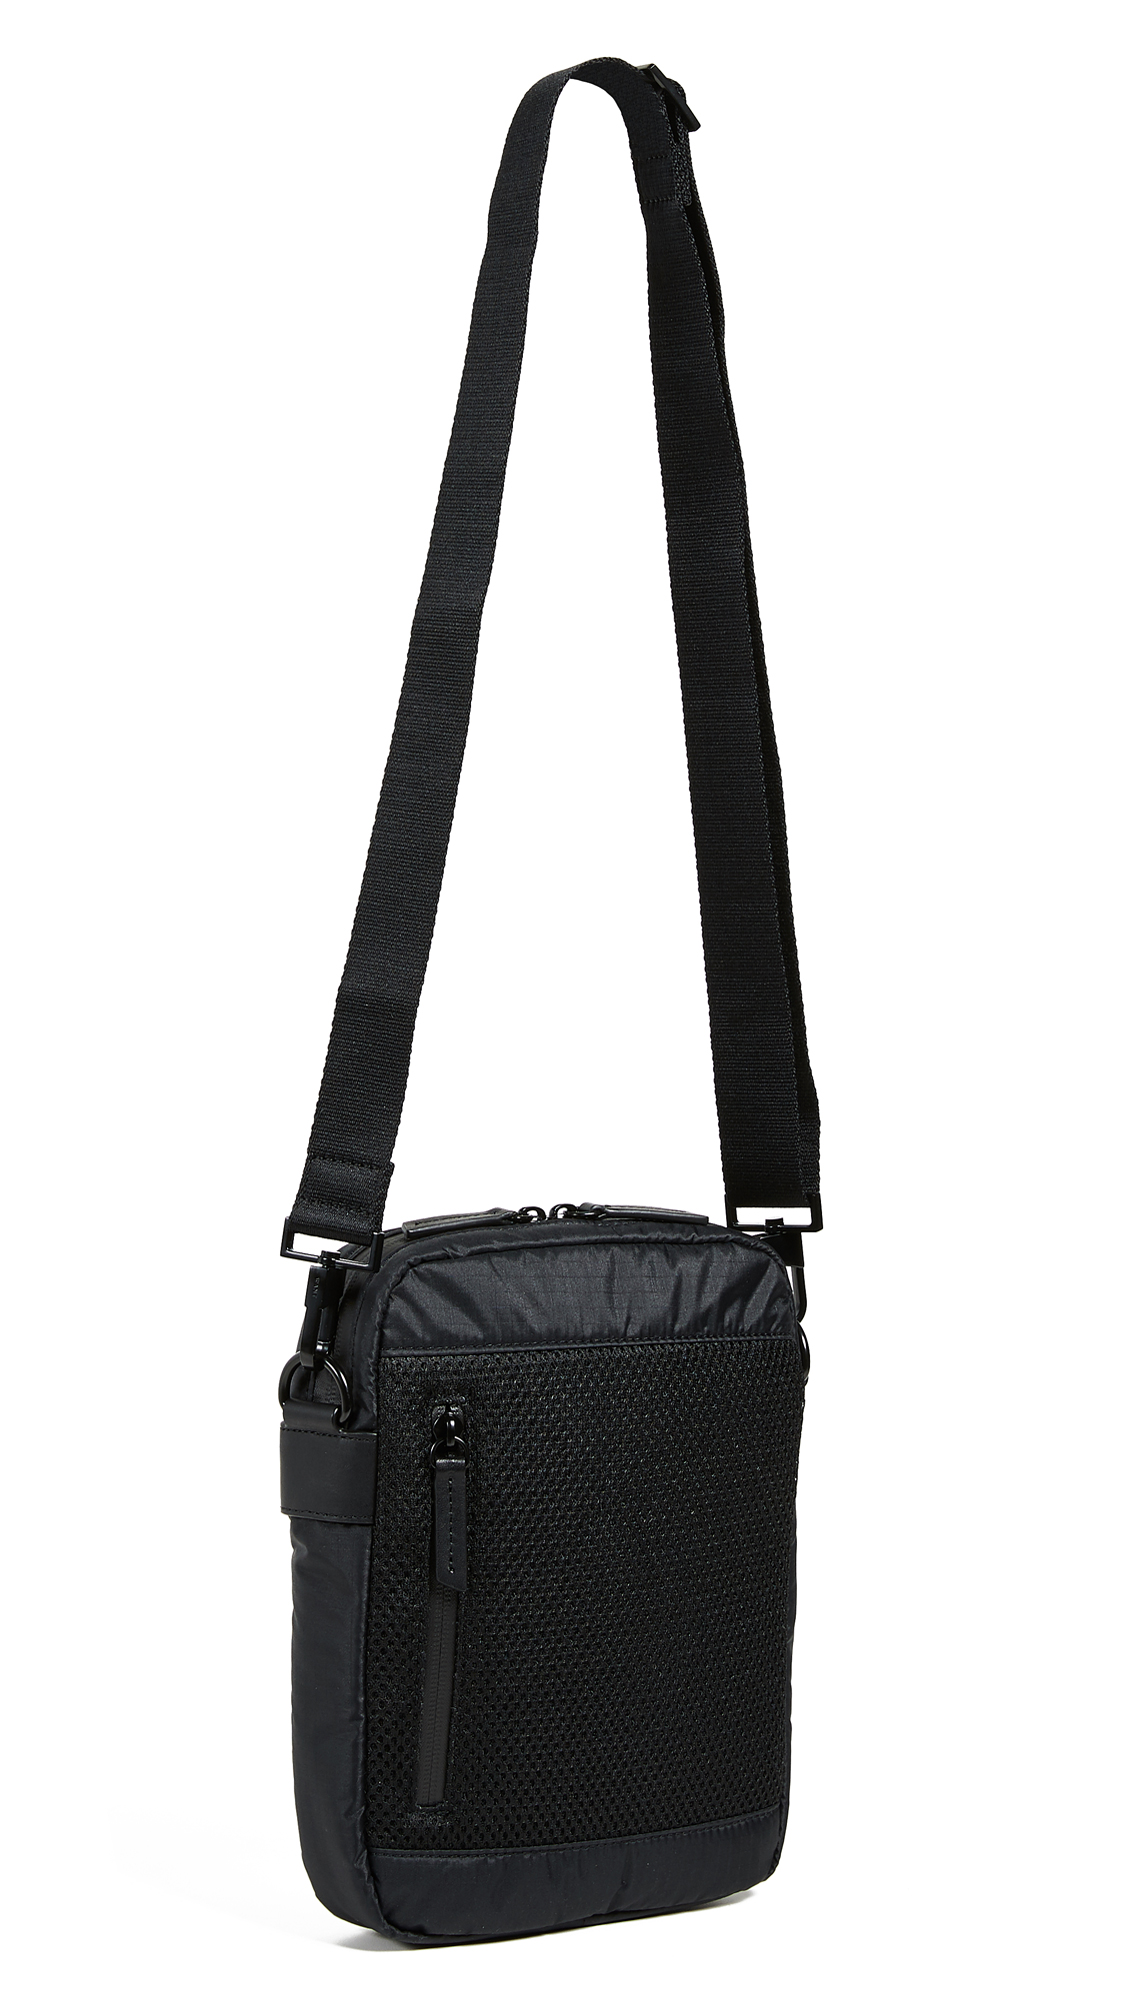 6fc482b785c2 WANT Les Essentiels Bryce Cross Body Messenger Bag